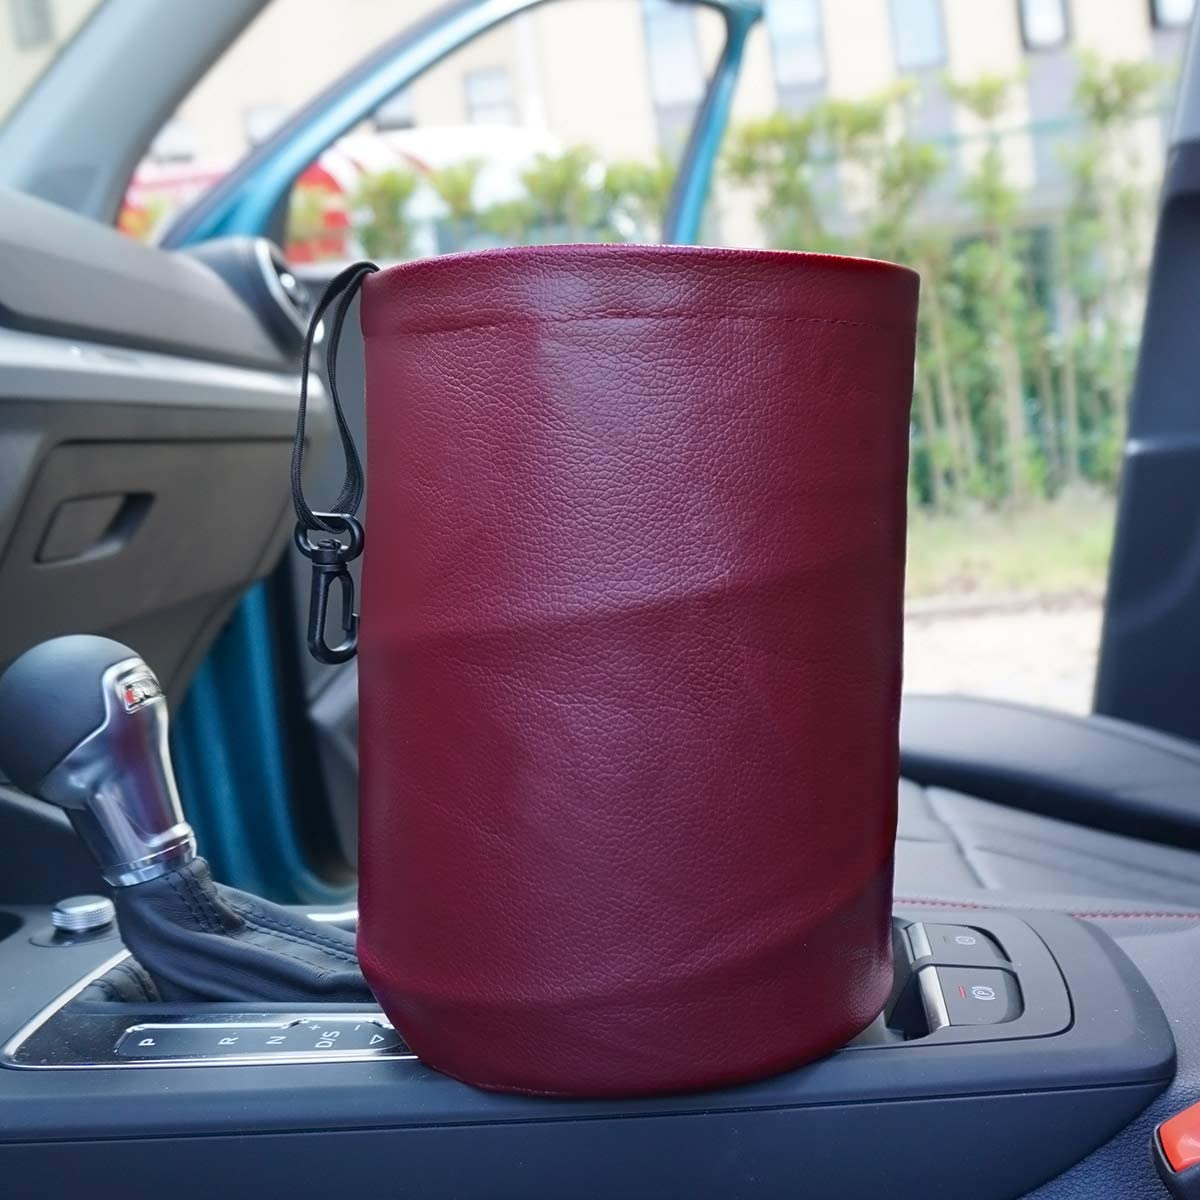 RED Rubbish Bin AMO Multifunctional Folding car Trash can,Double Waterproof Leather Car Garbage Can Organizer,Waste Baskets